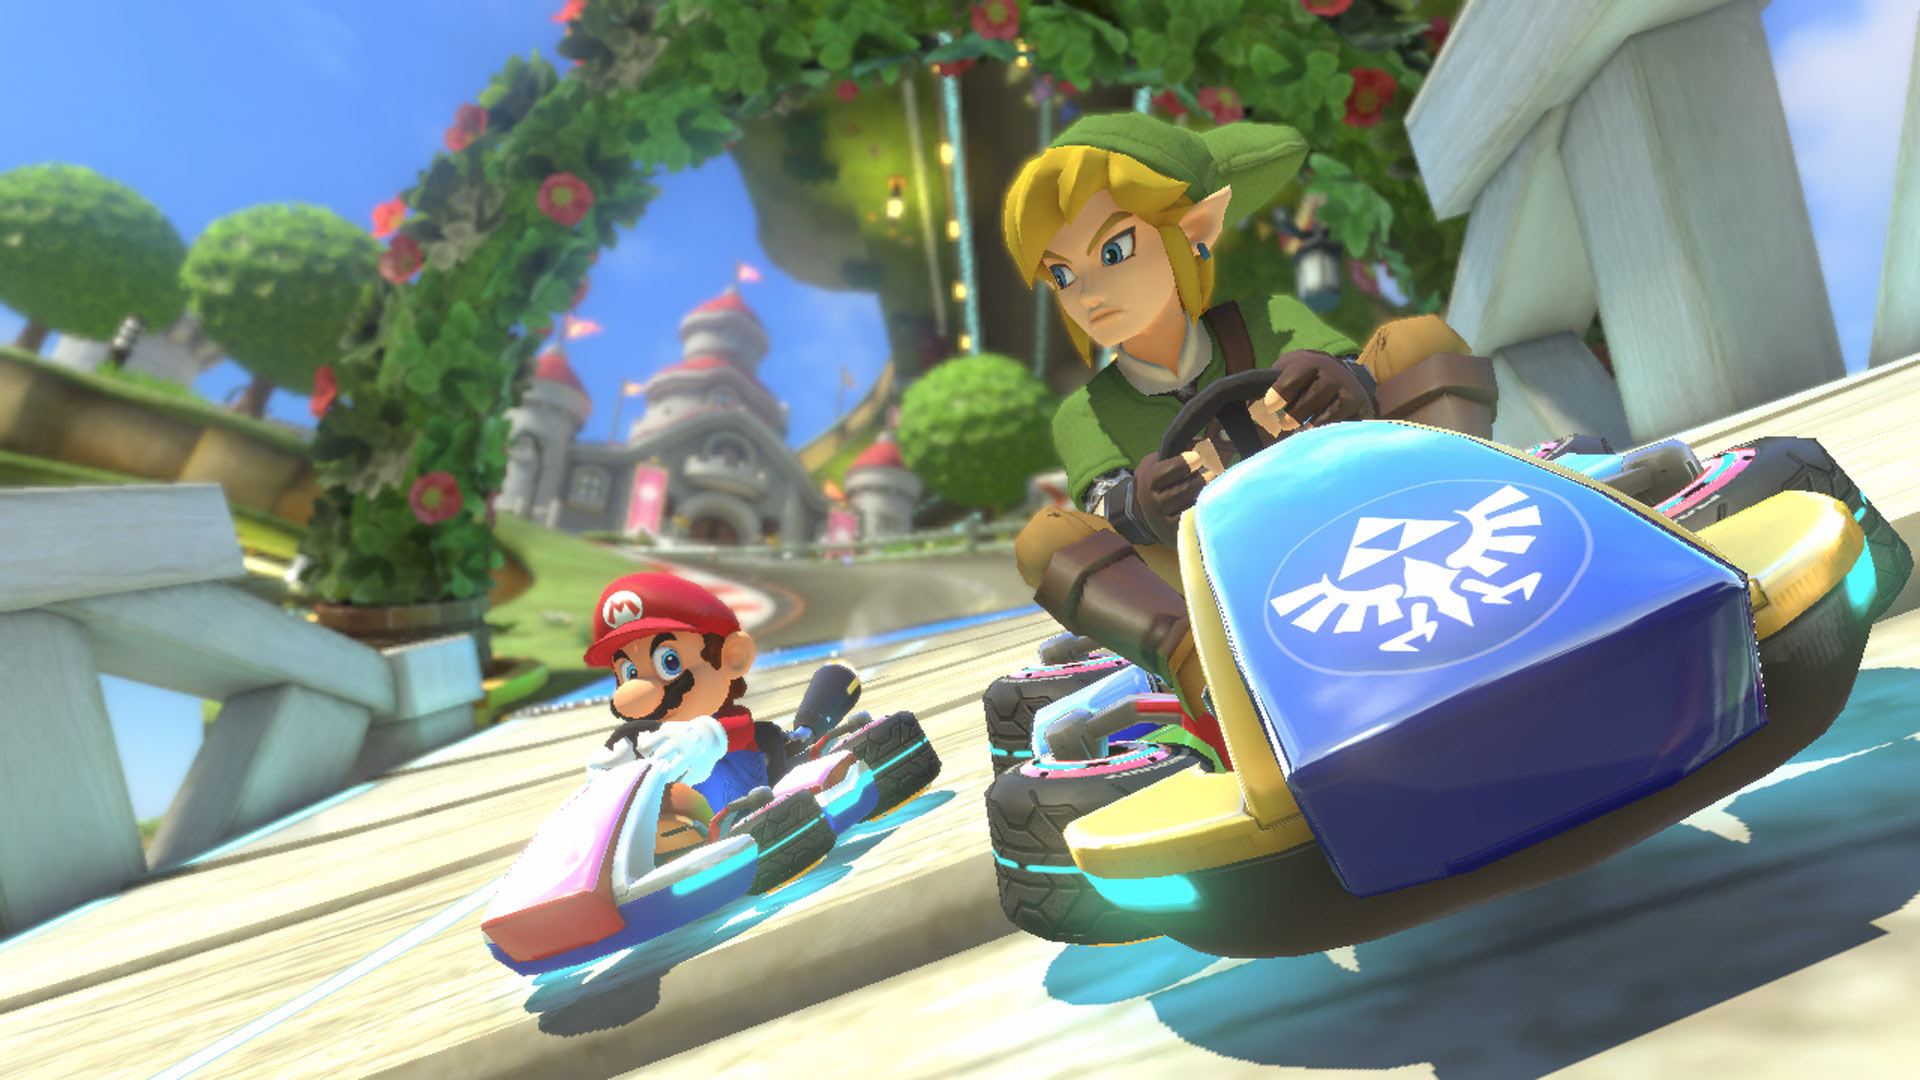 Mario Kart 8 Wallpaper 1920x1080 52521